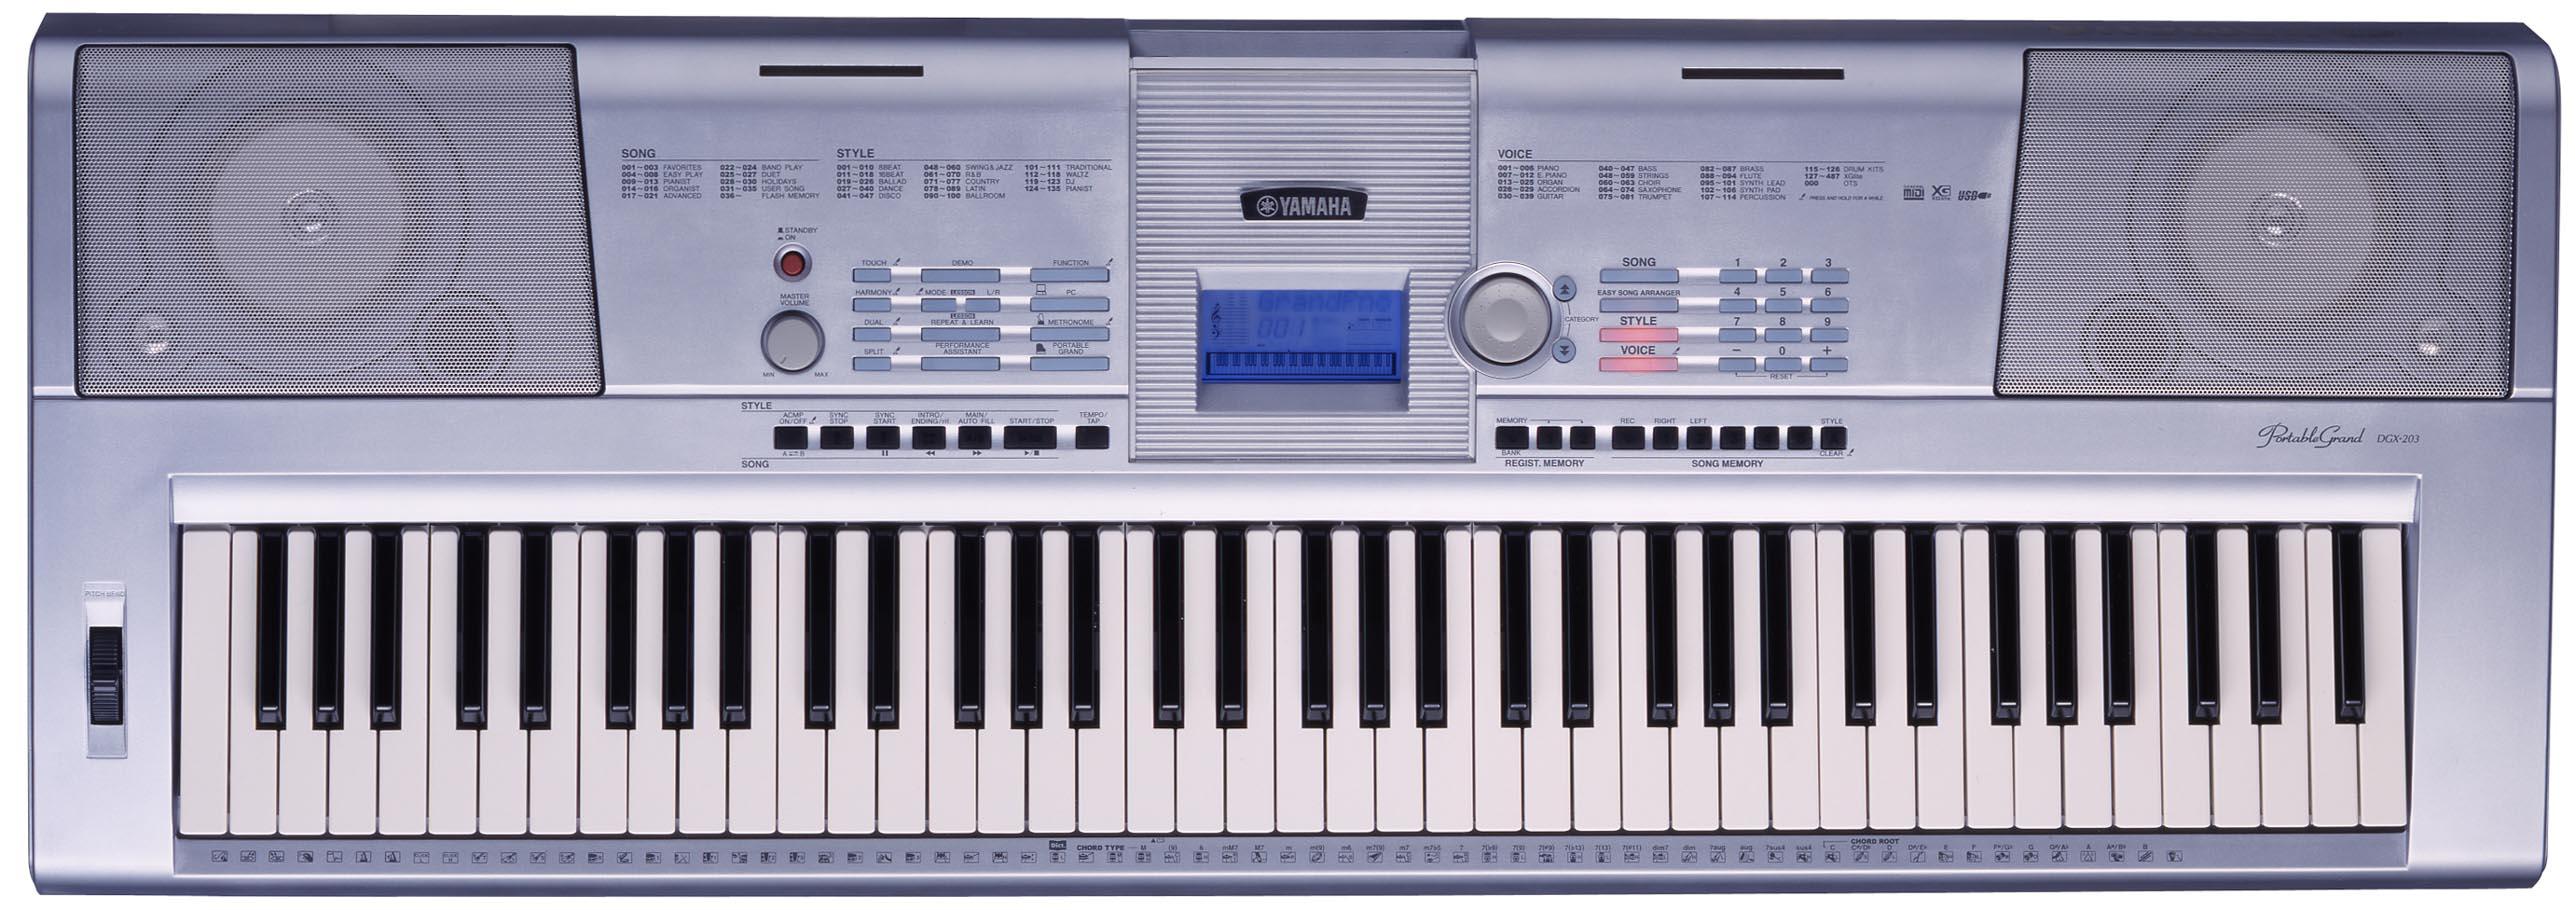 Yamaha dgx 205 image 631755 audiofanzine for Yamaha dgx 200 portable grand keyboard